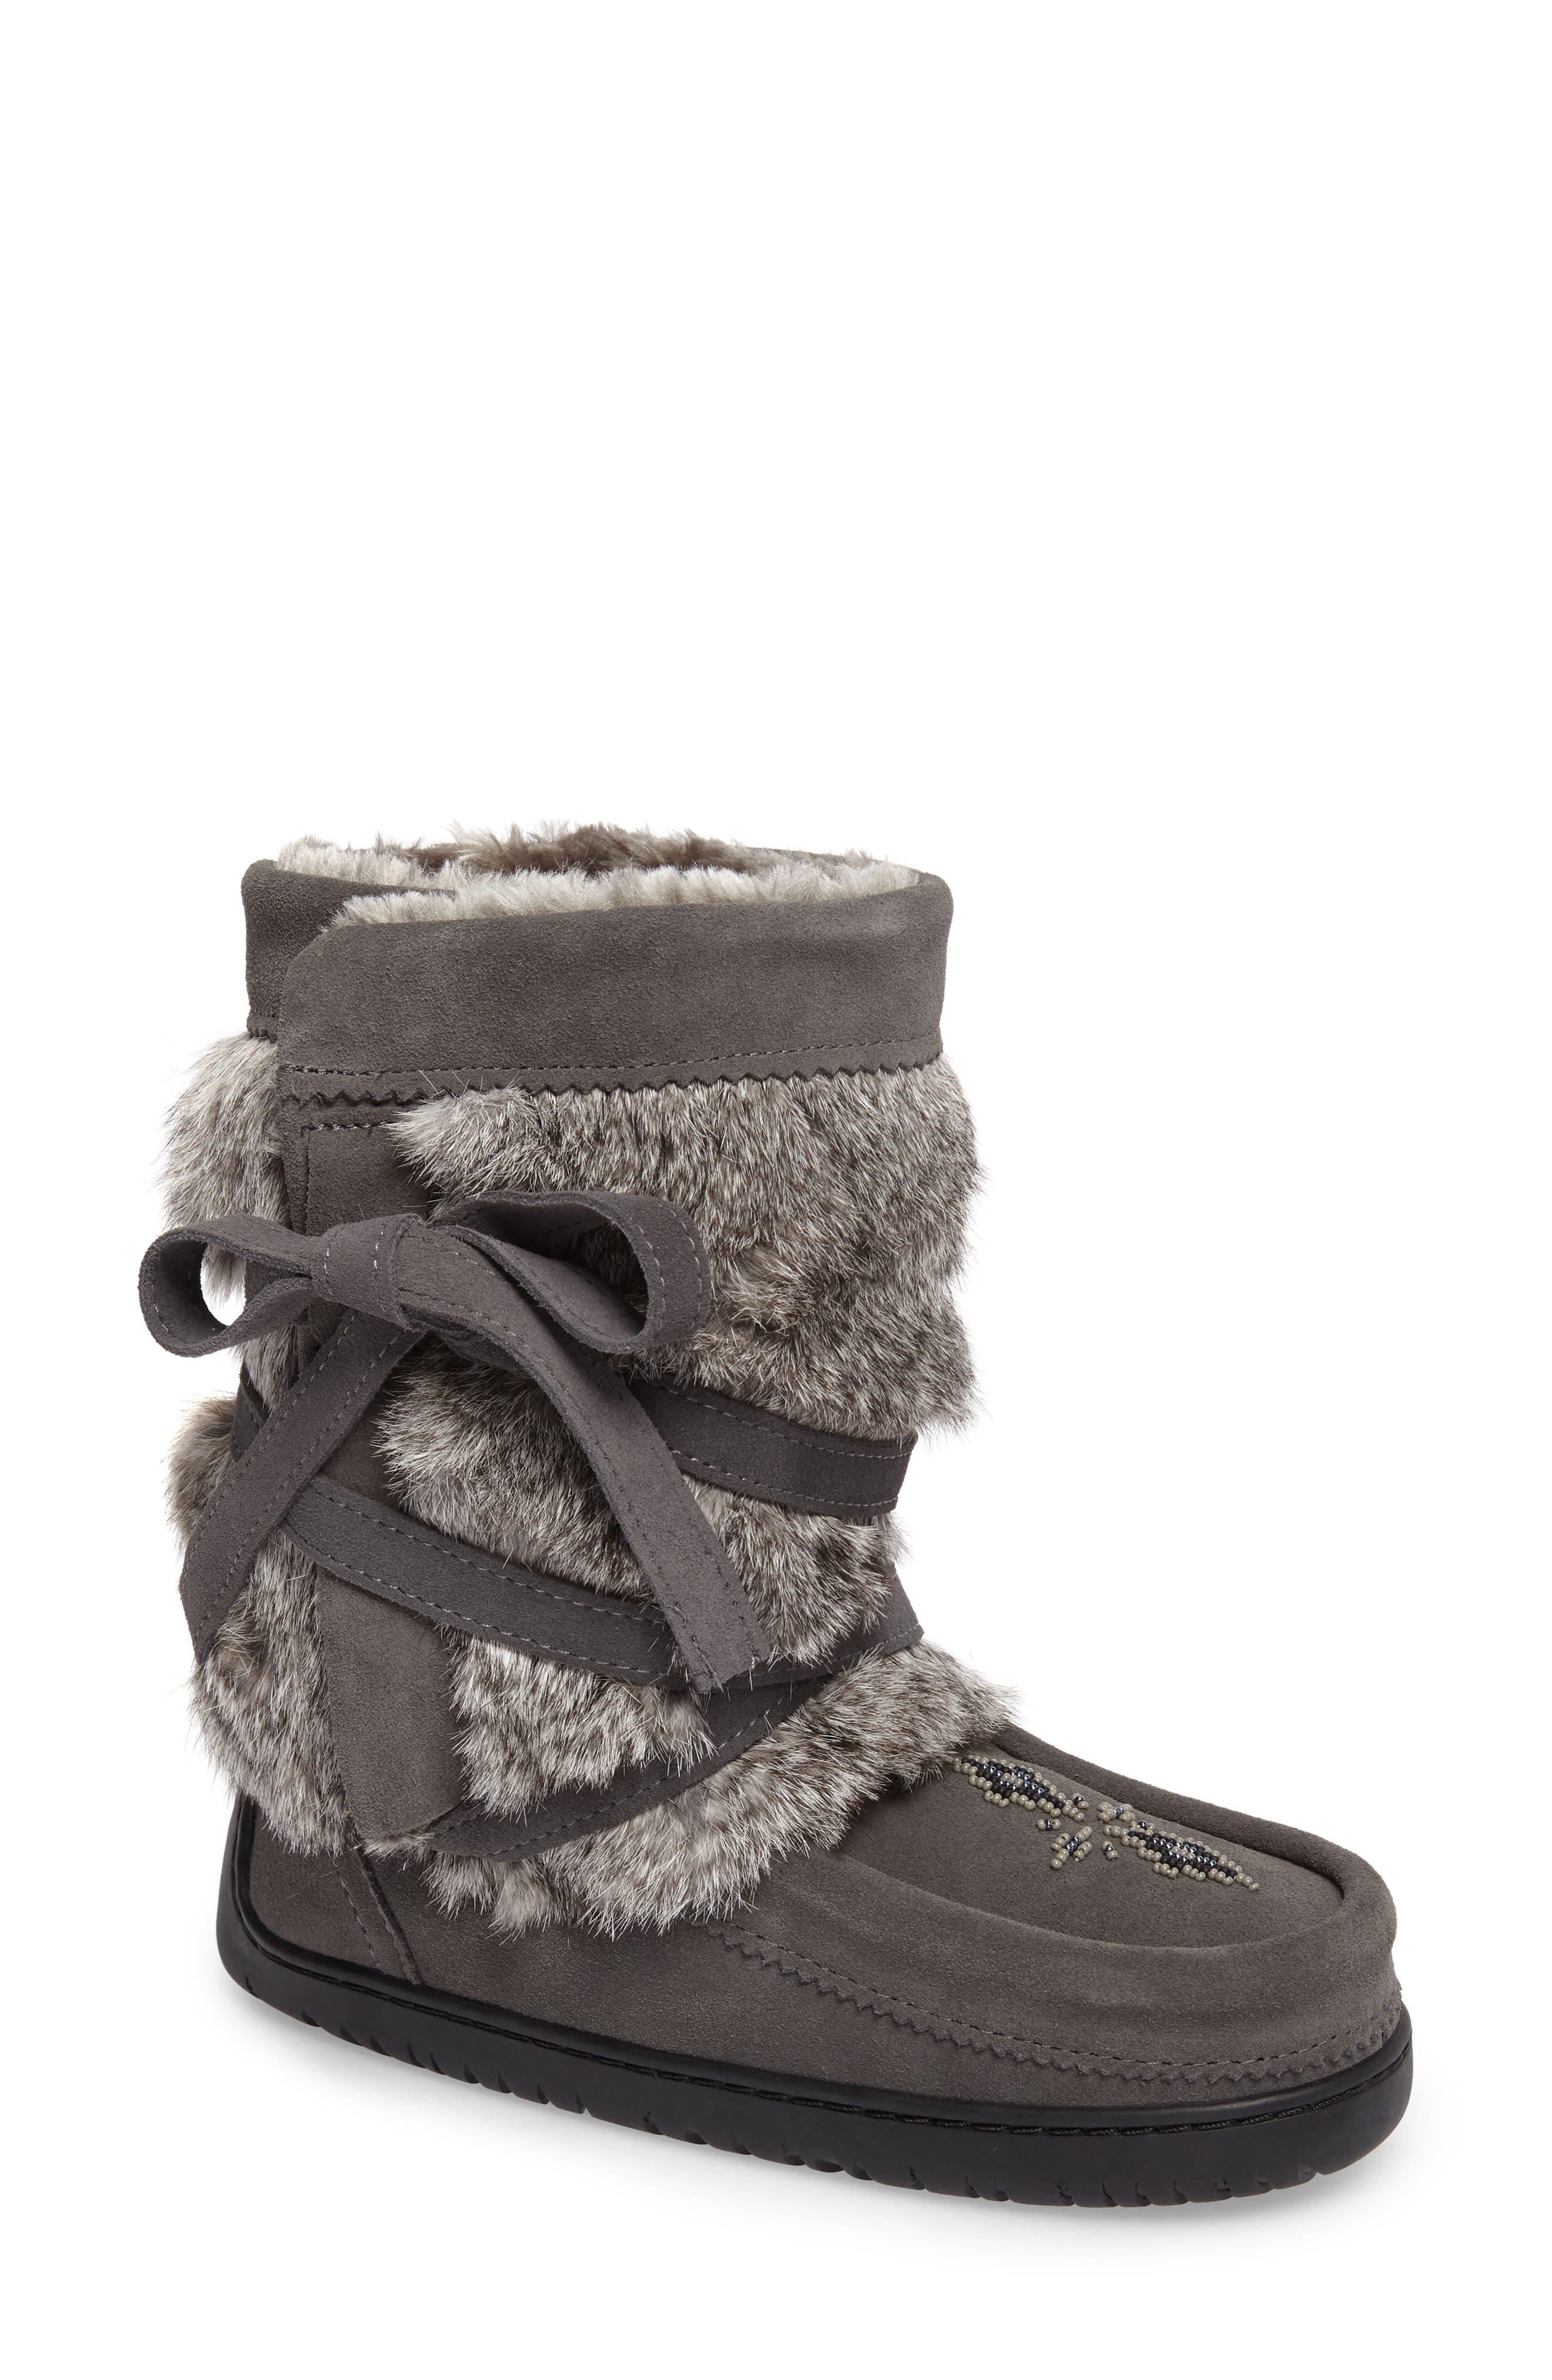 Manitobah Mukluks Beaded Short Wrap Genuine Rabbit Fur & Shearling Boot (Women)